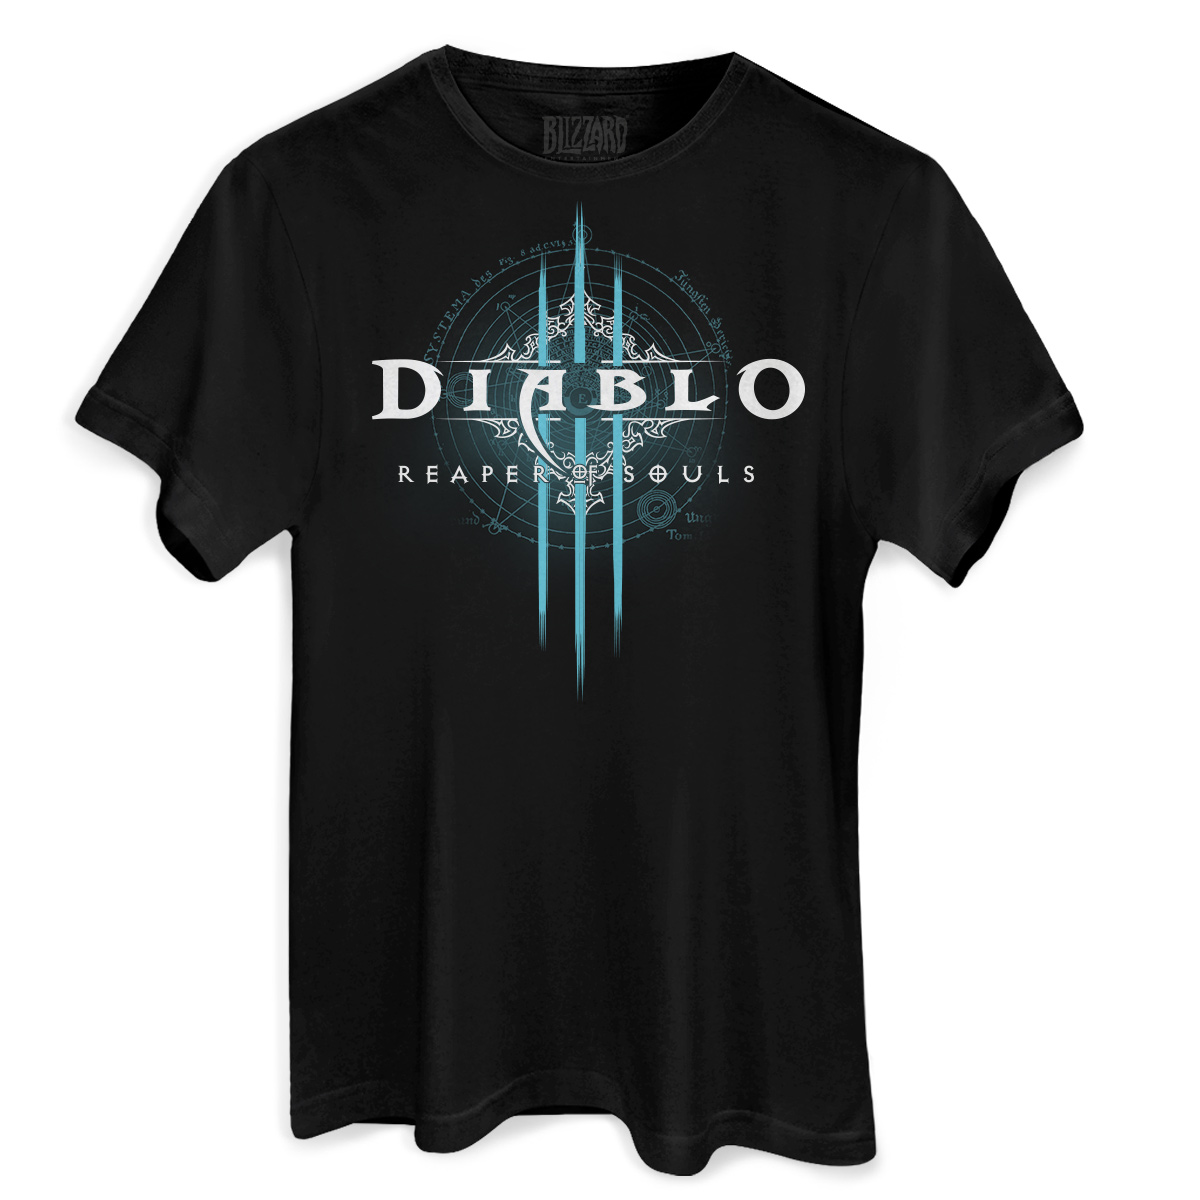 Camiseta Masculina Diablo III Reaper of Souls